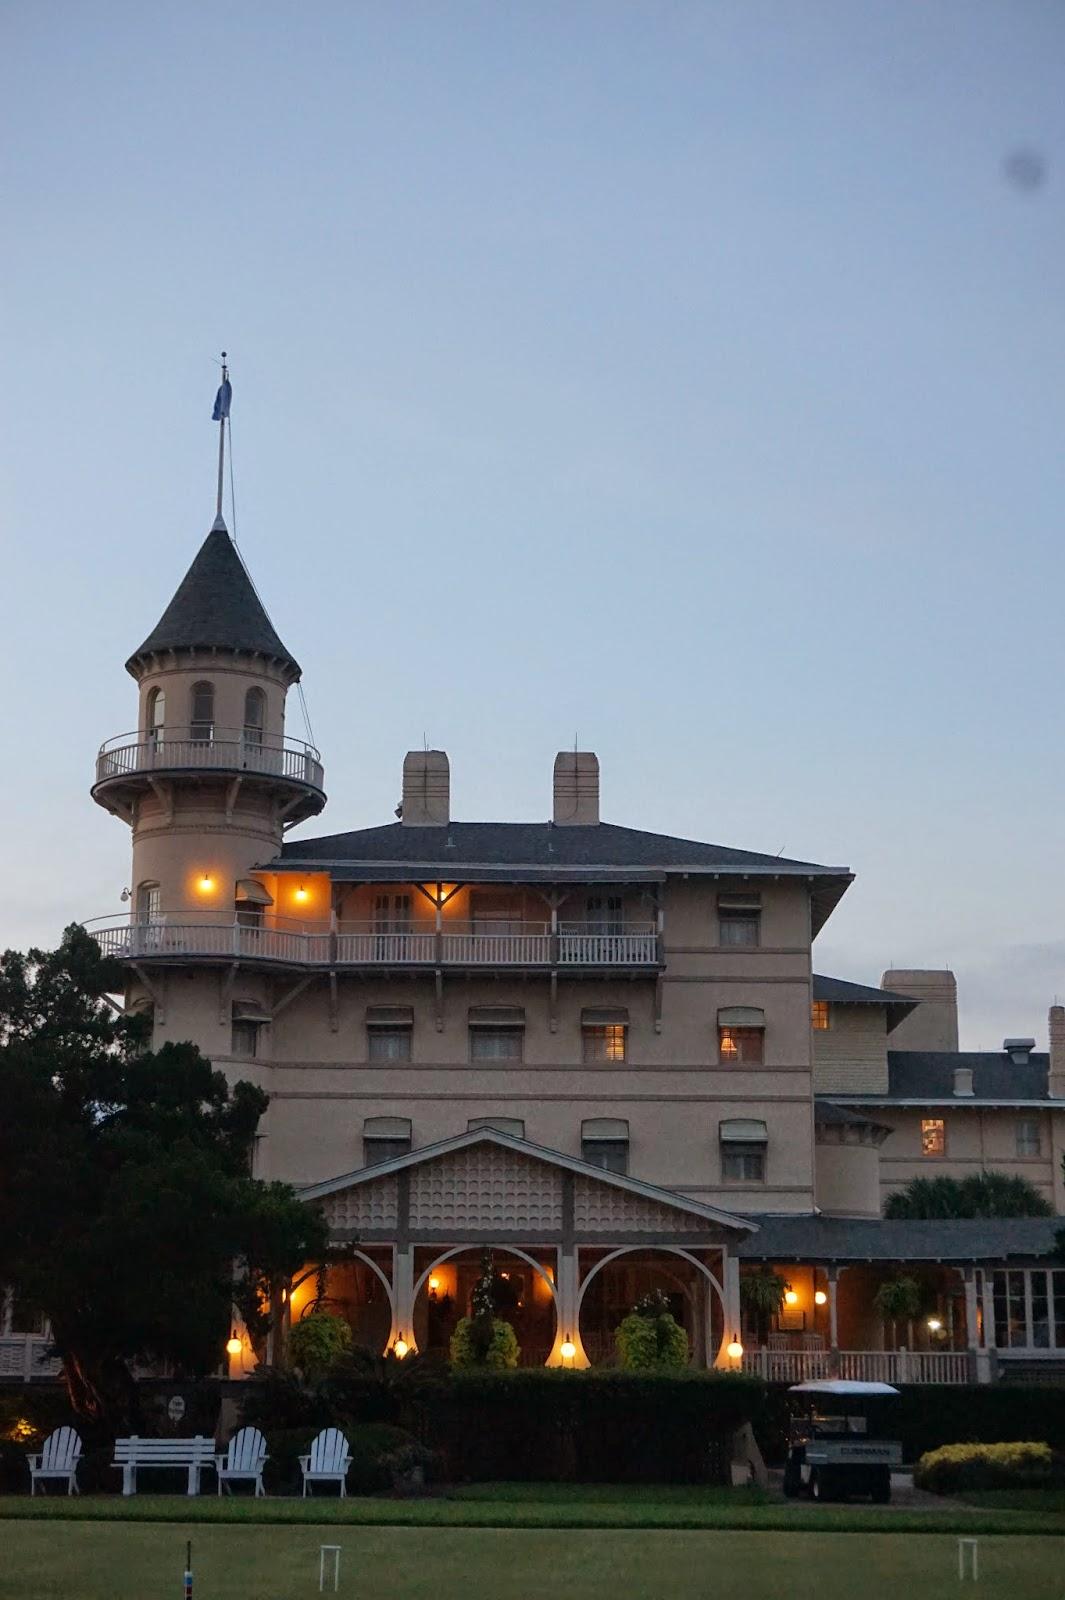 Jekyll Island Club Hotel: A Tour | CosmosMariners.com